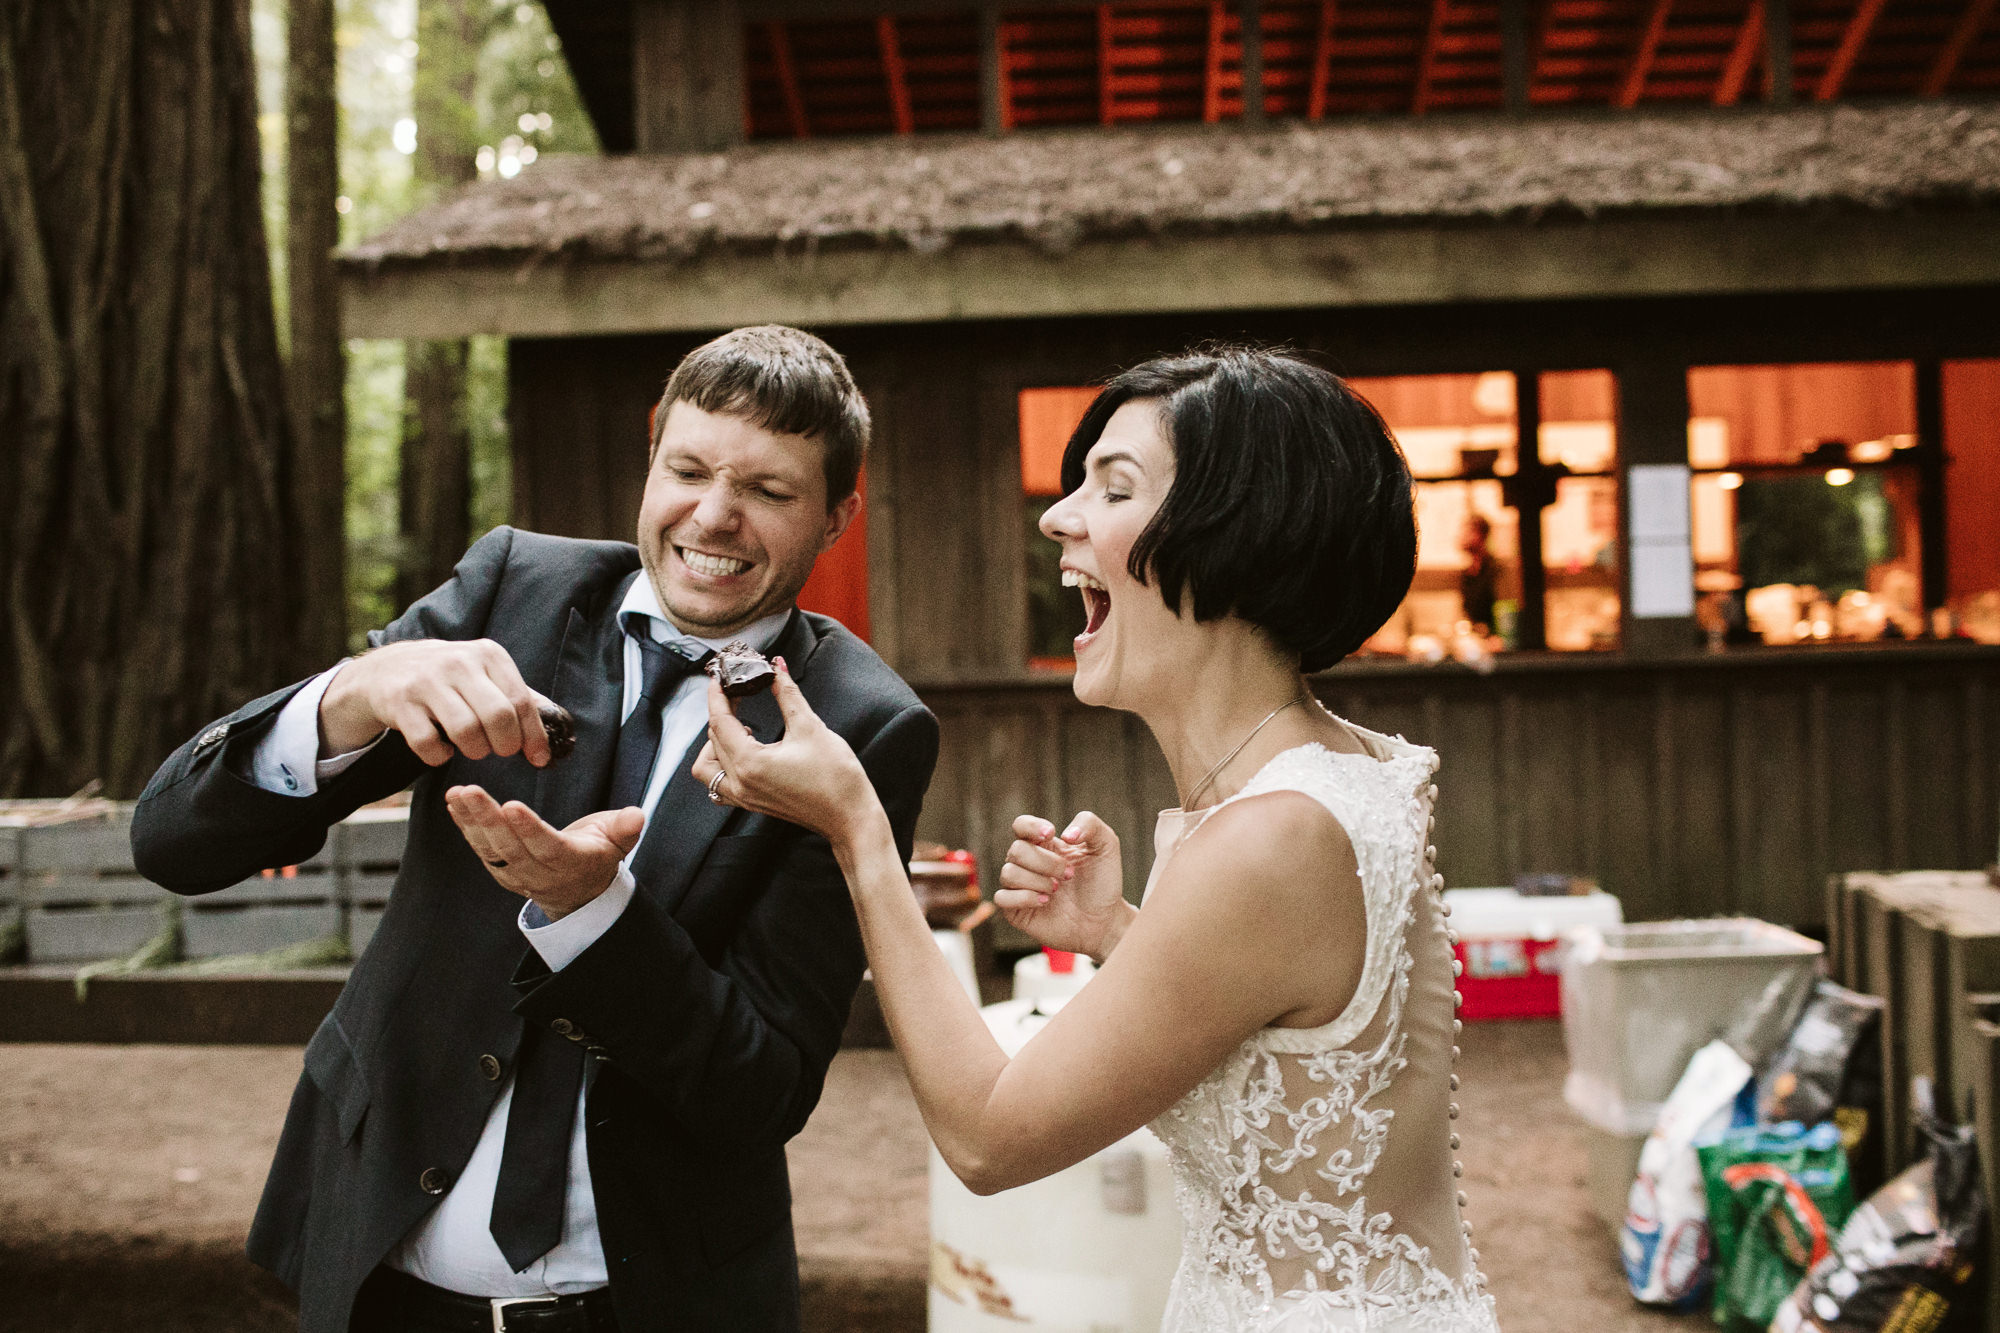 California-wedding-photographer-alfonso-flores-pamplin-groove-335.jpg